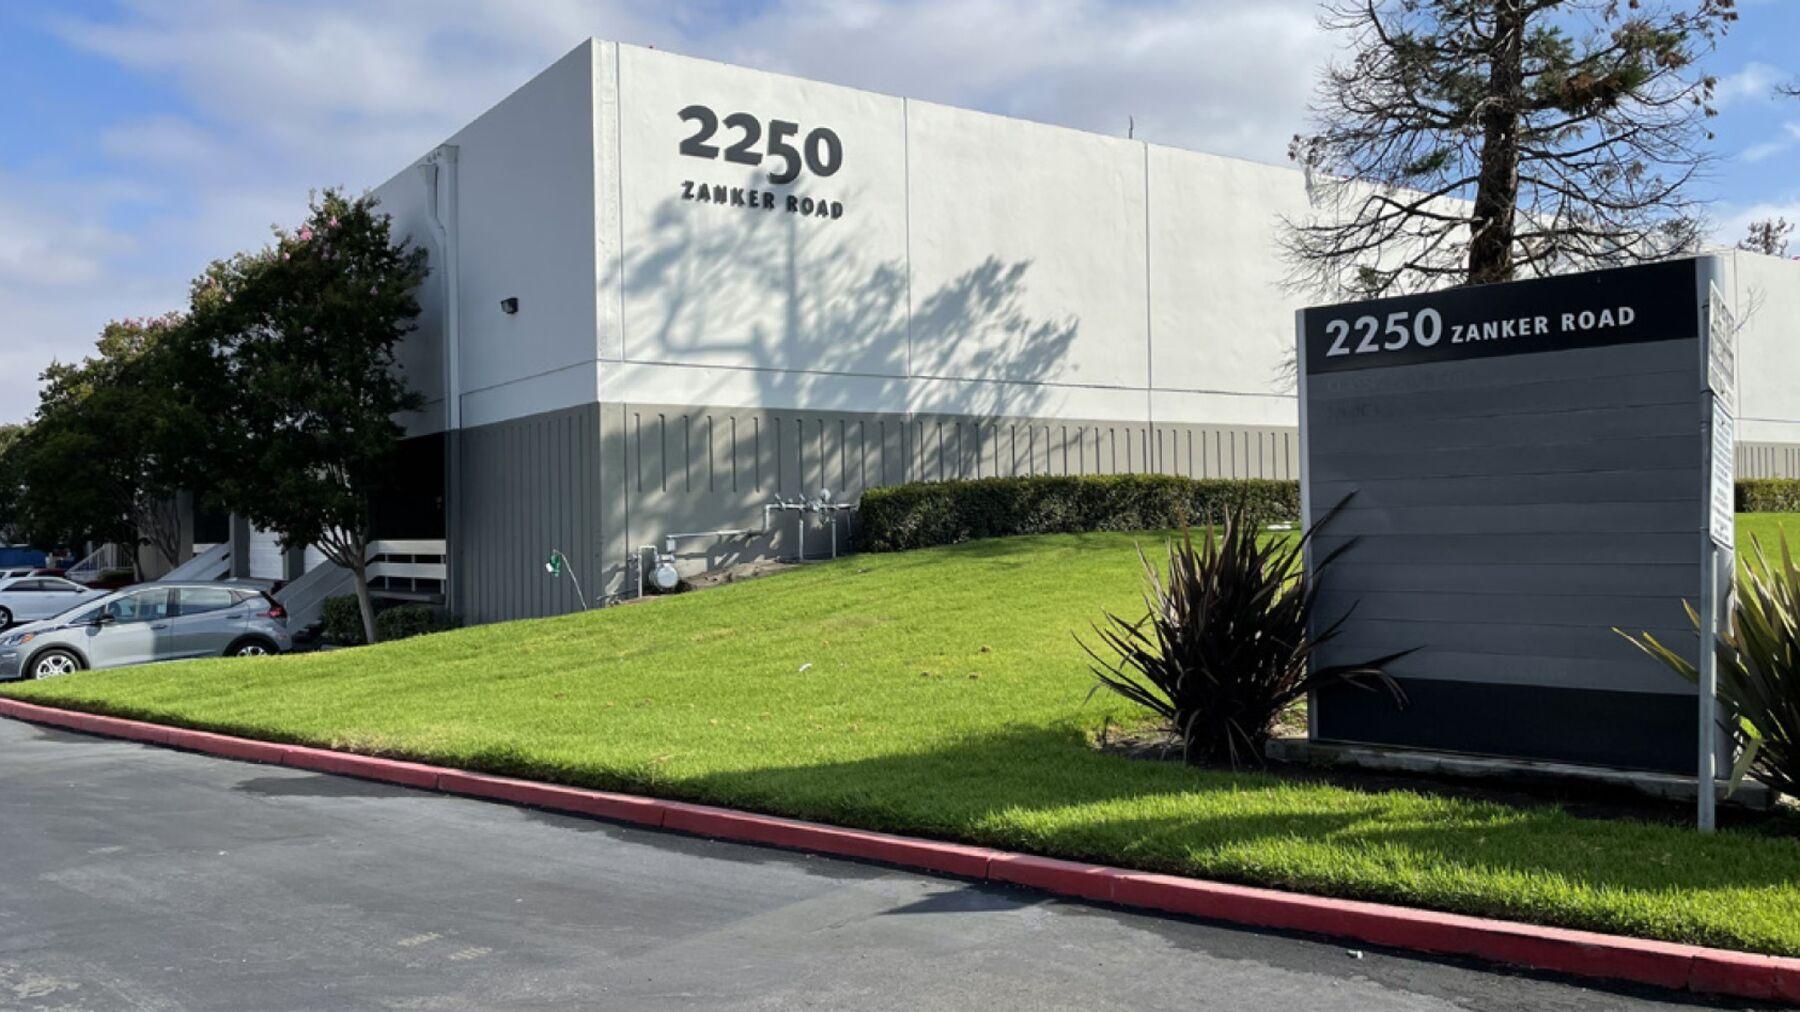 DPM-2250-Zanker-Rd-Unit-A1-B-North-San-Jose-40-sba02709-Hero.jpg